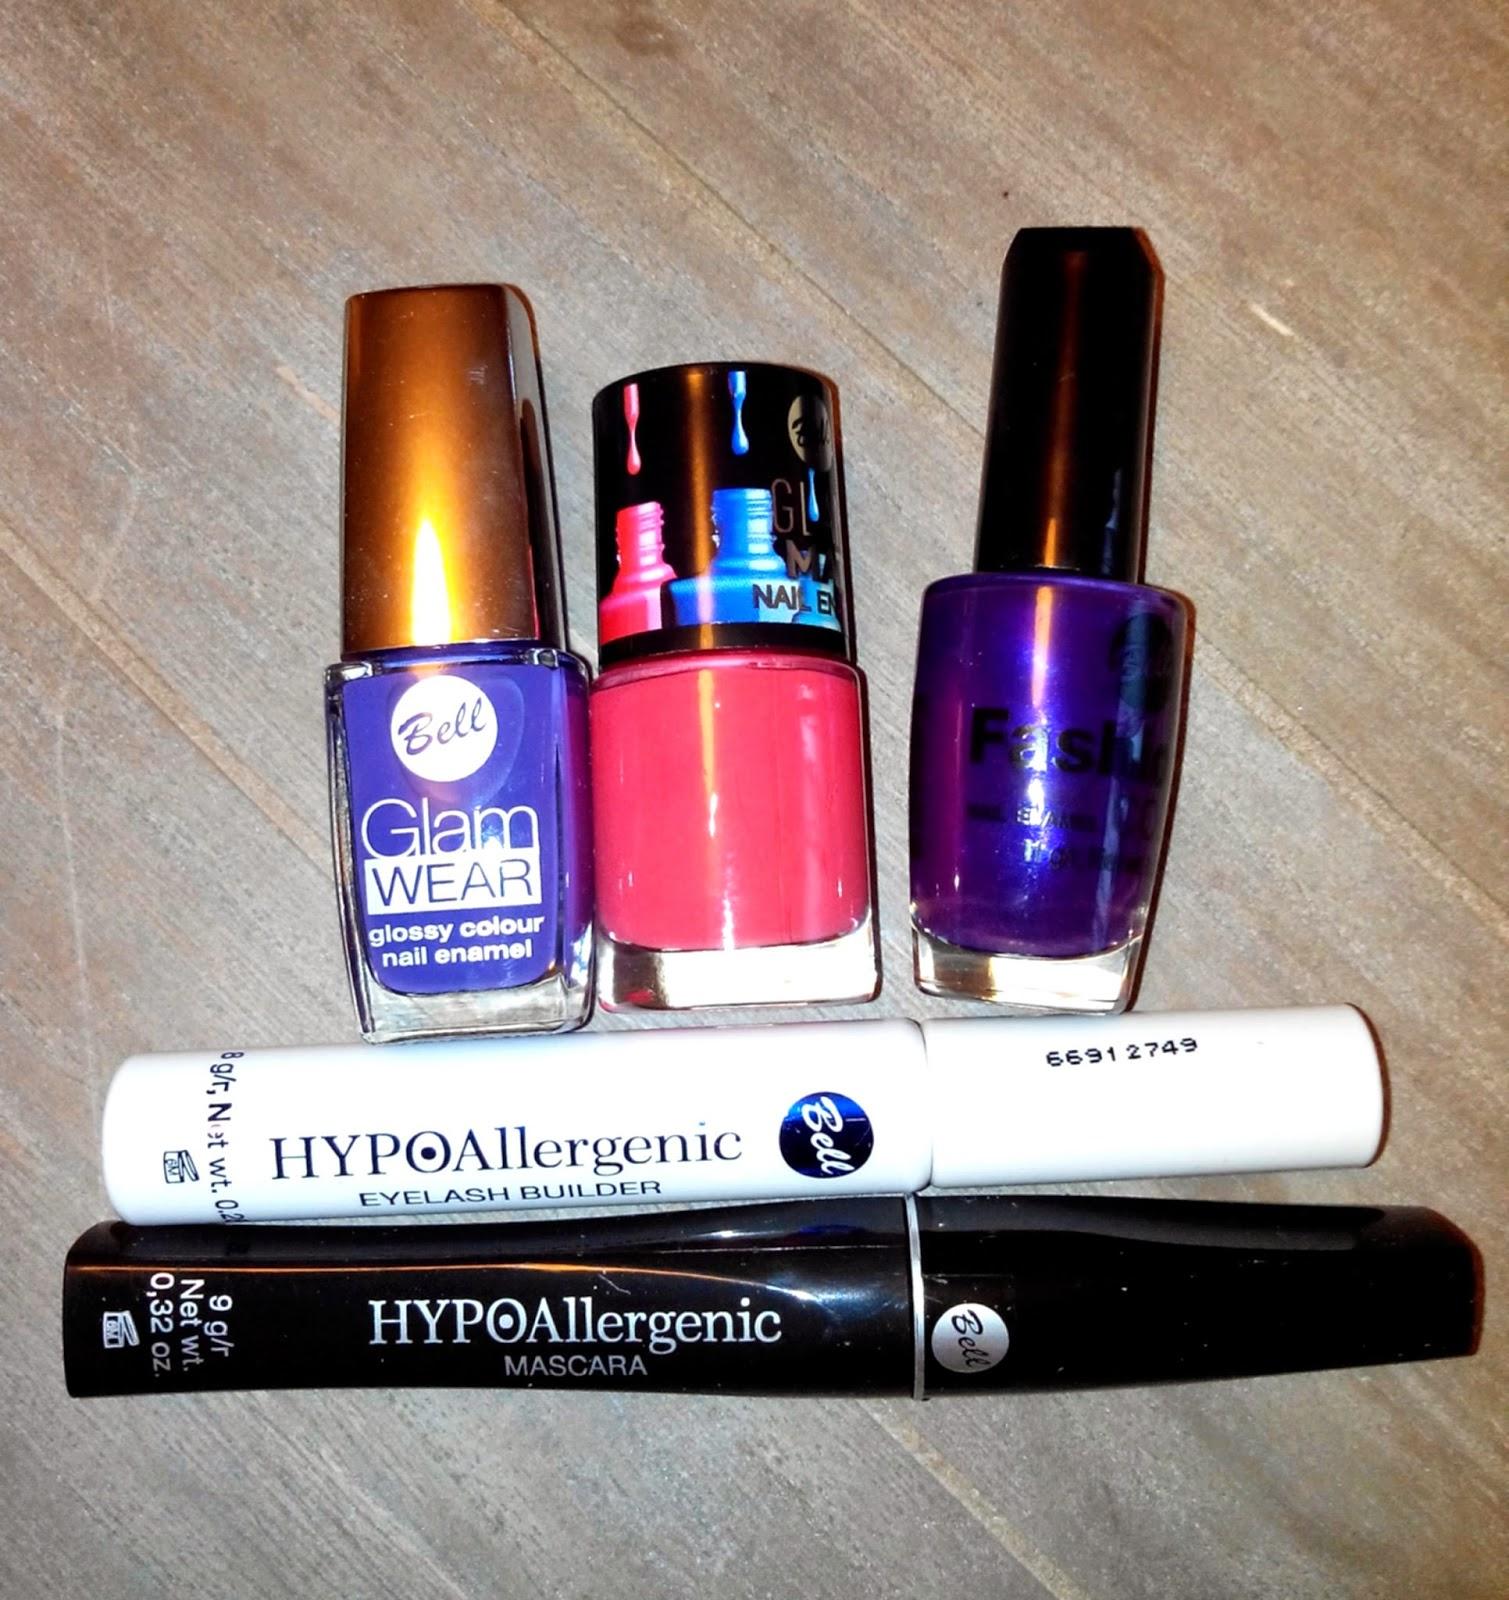 mascara,vernis, manucure, violet, rouge, bell, kosméopolis, bullelodie